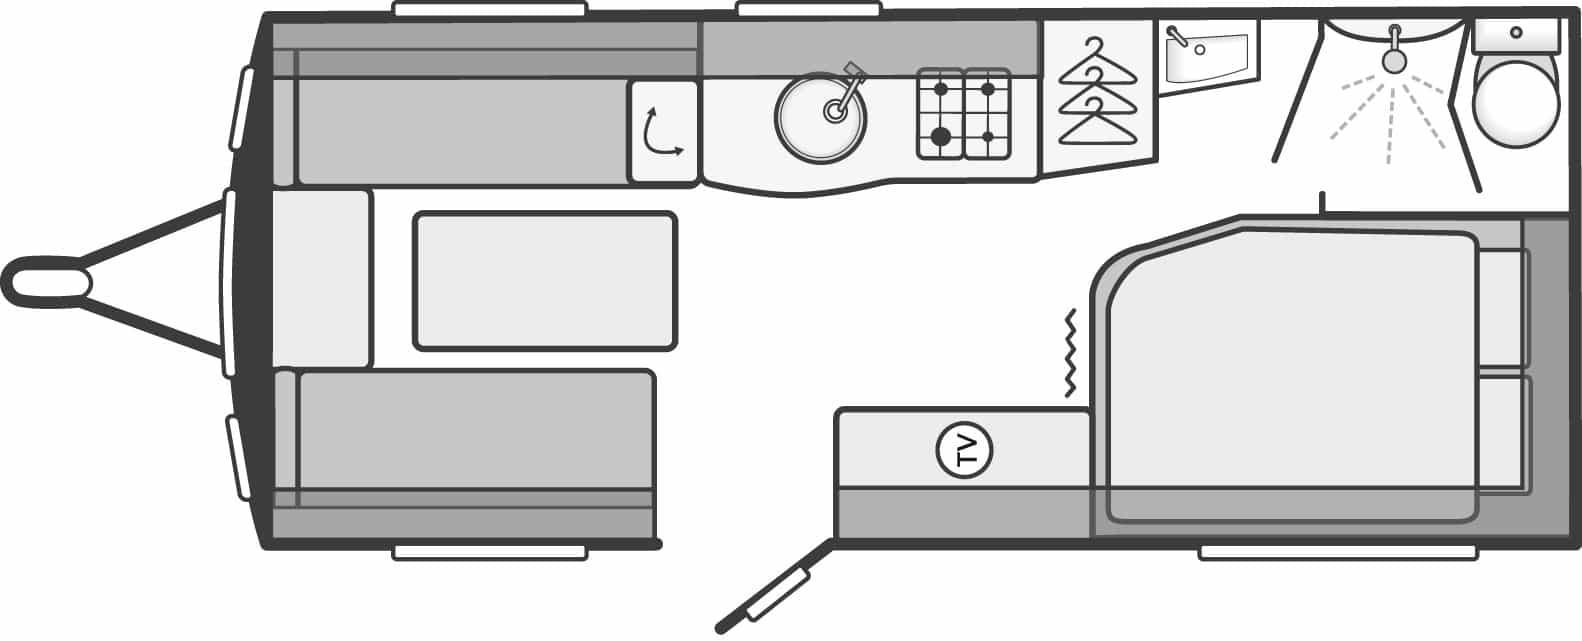 Sterling Eccles 510 - 4 Berth, Side Fixed Bed, Corner Washroom